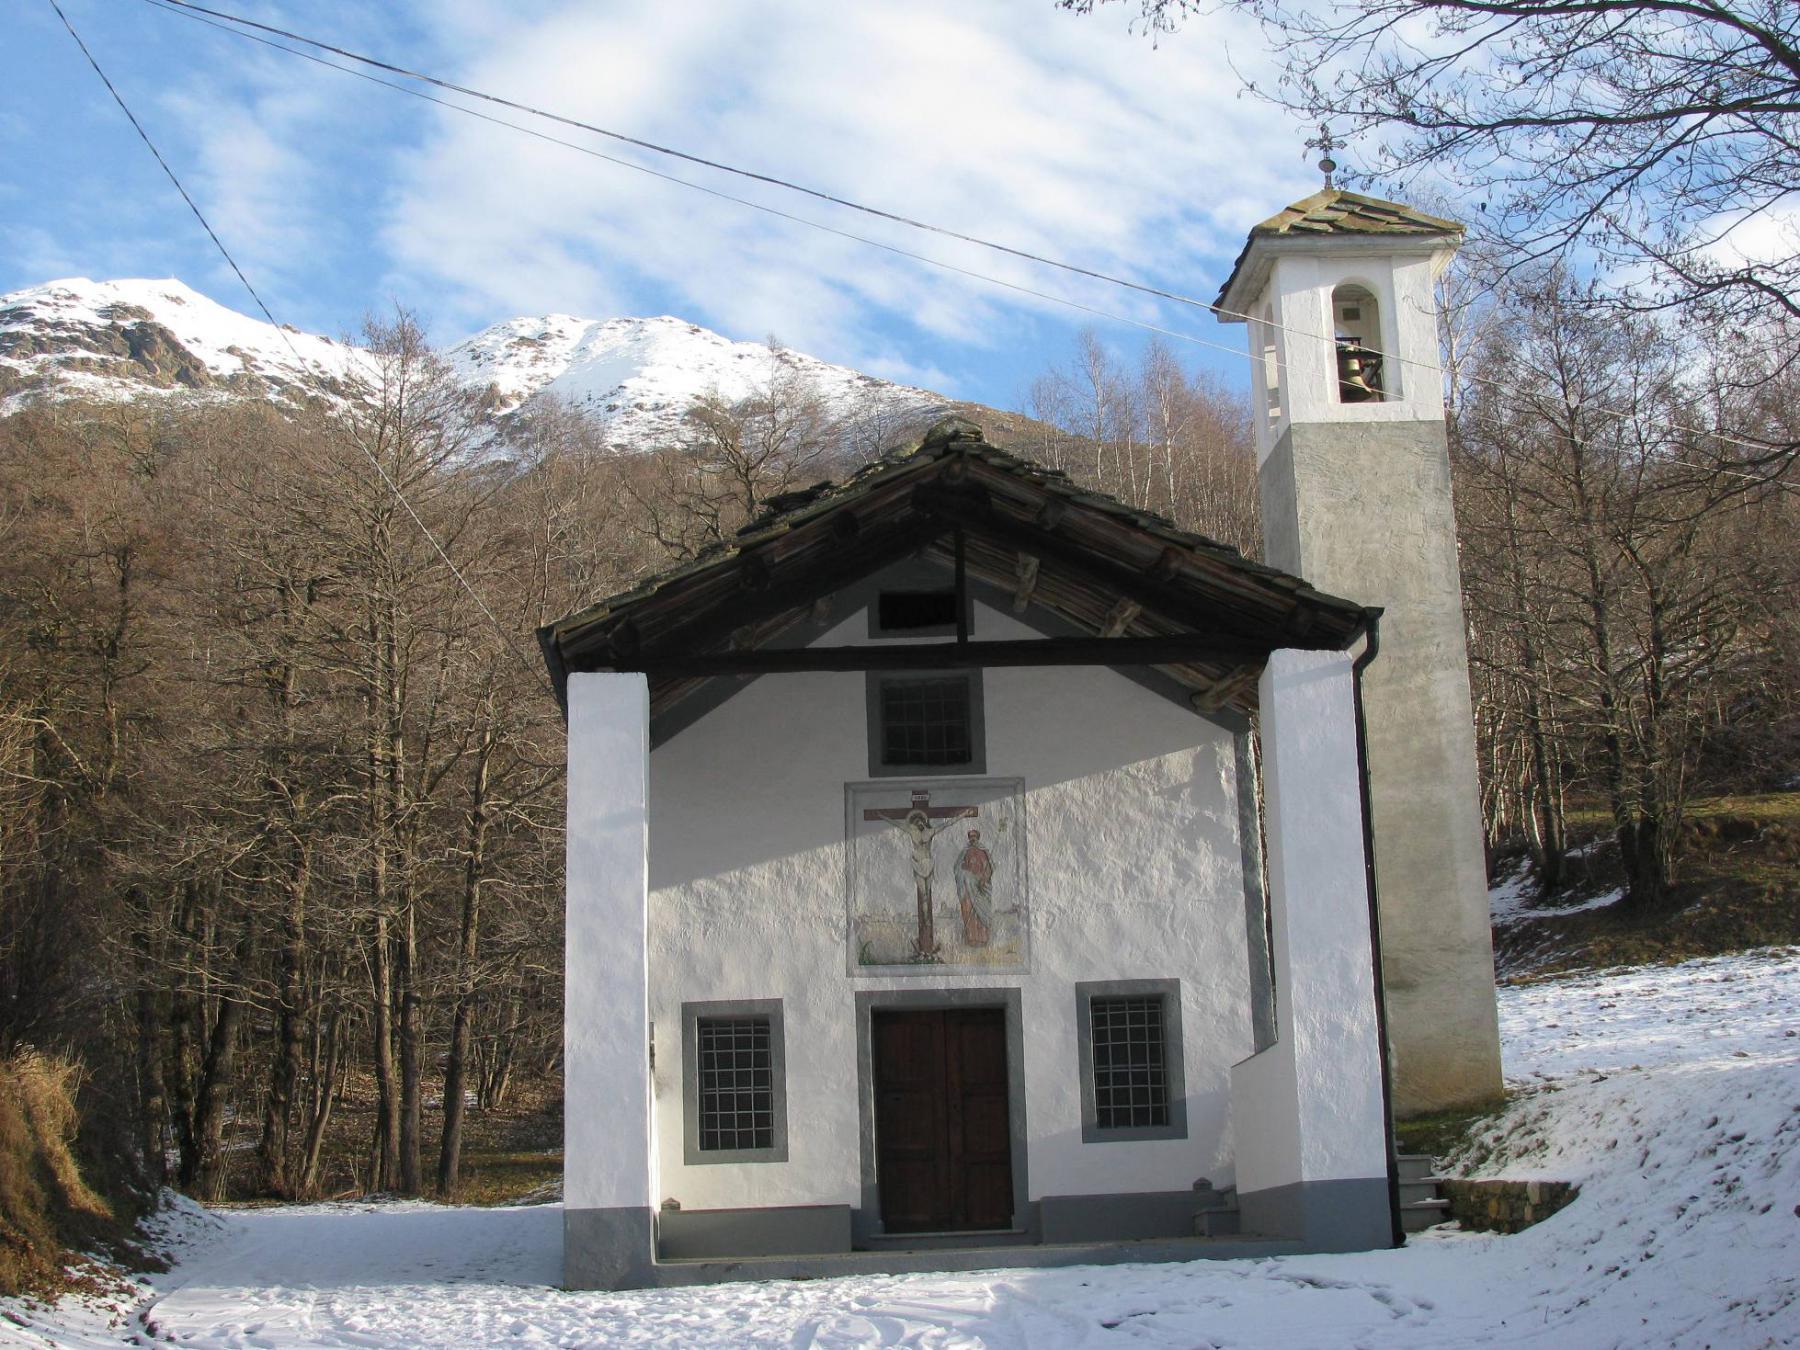 Chiesetta Santa Croce